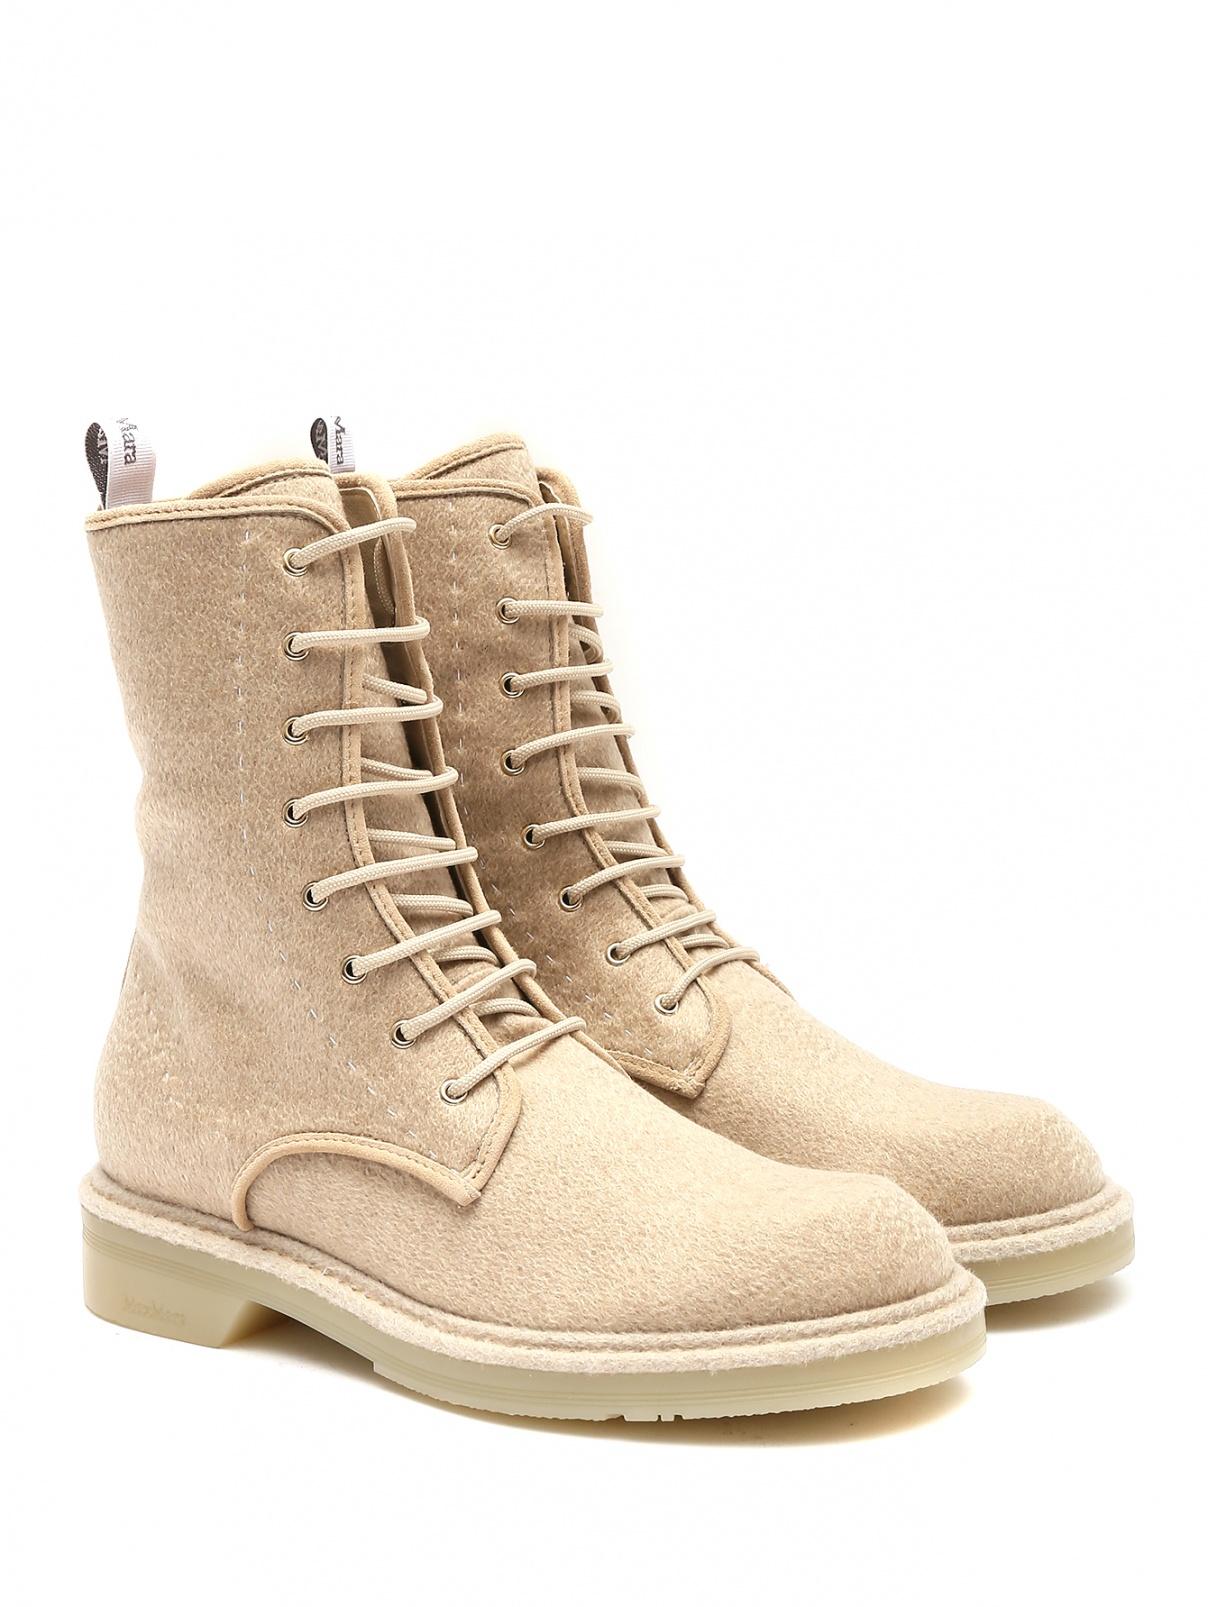 Ботинки из кашемира на шнурках Max Mara  –  Общий вид